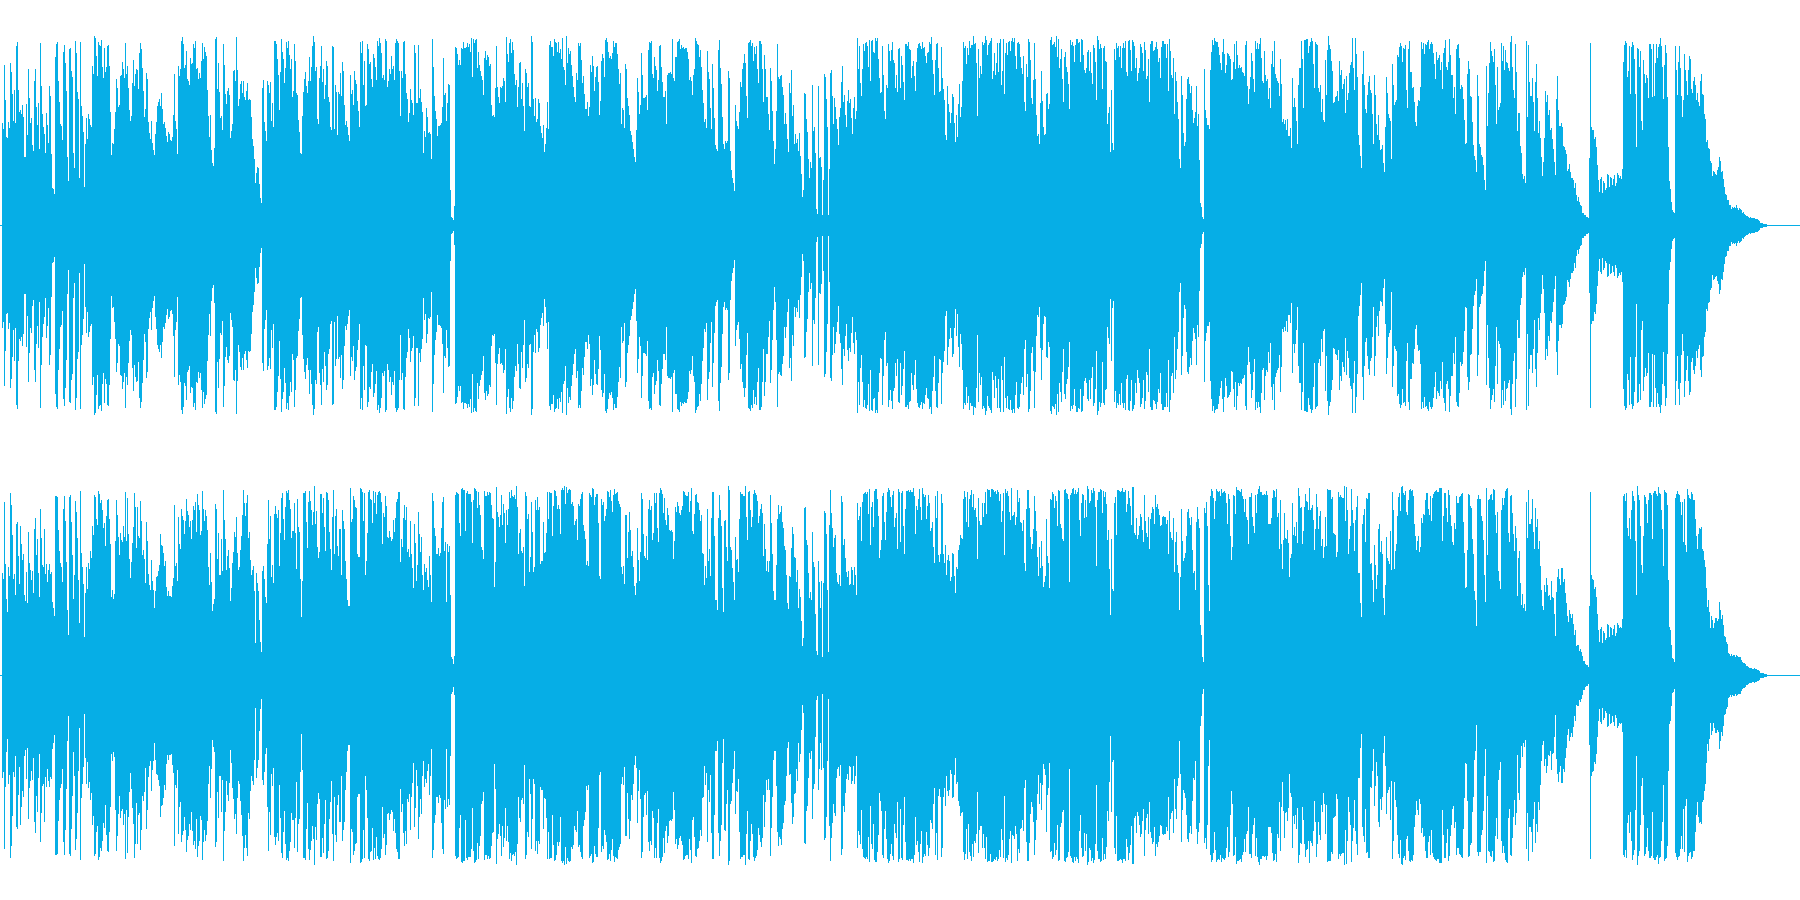 Danny Boy (sax)の再生済みの波形